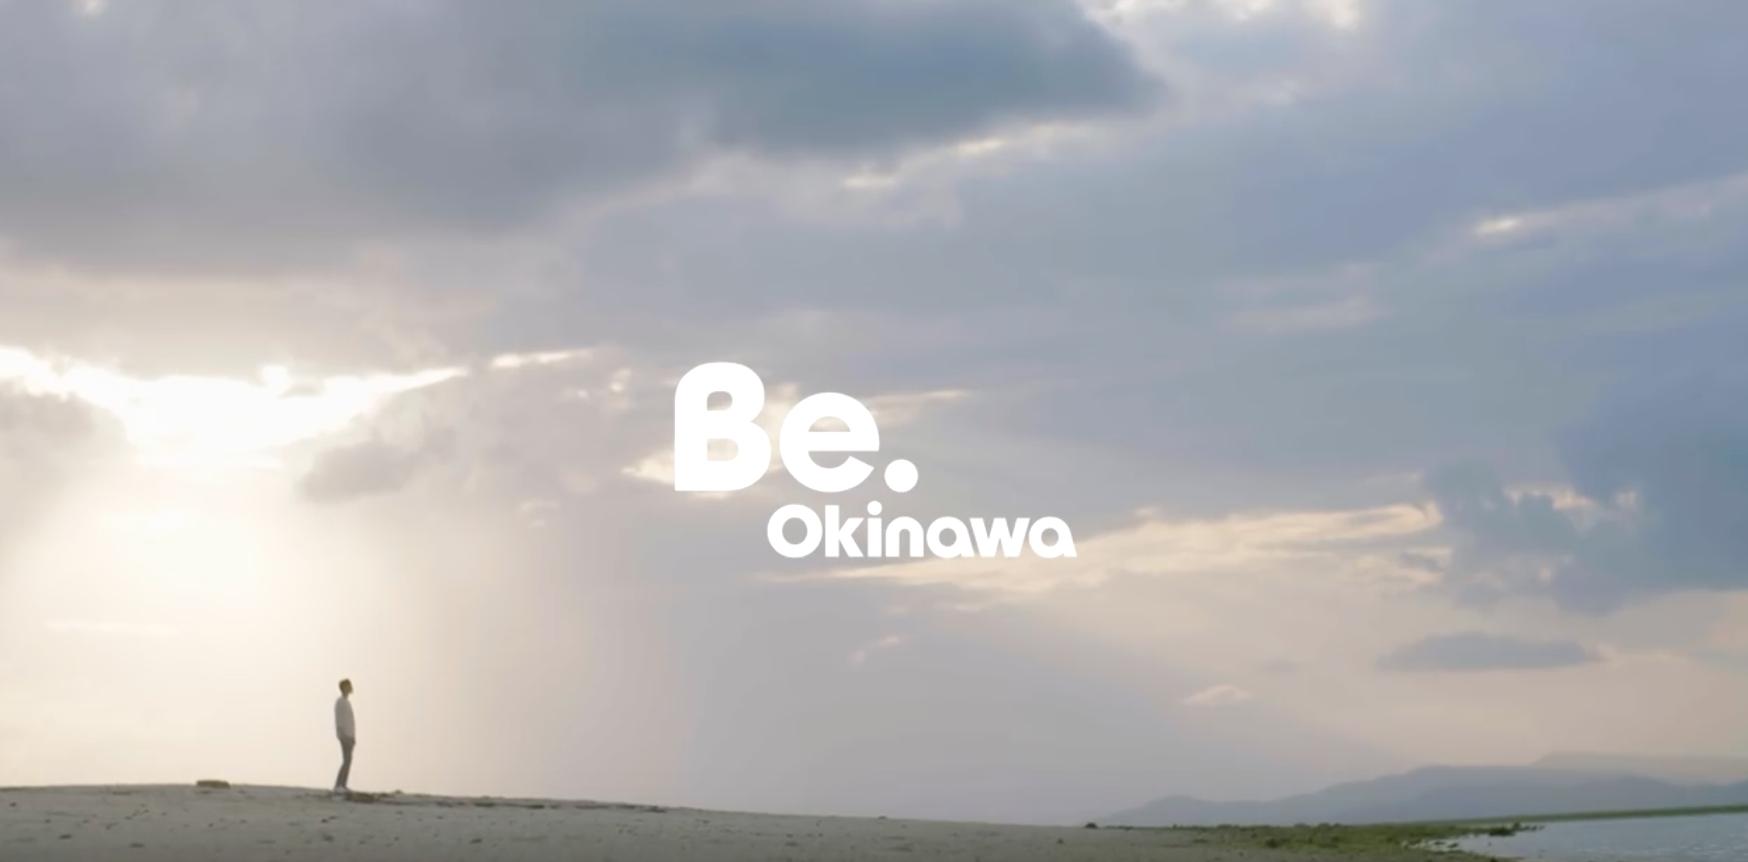 Be. Okinawa 【いのちにちからをくれる島】